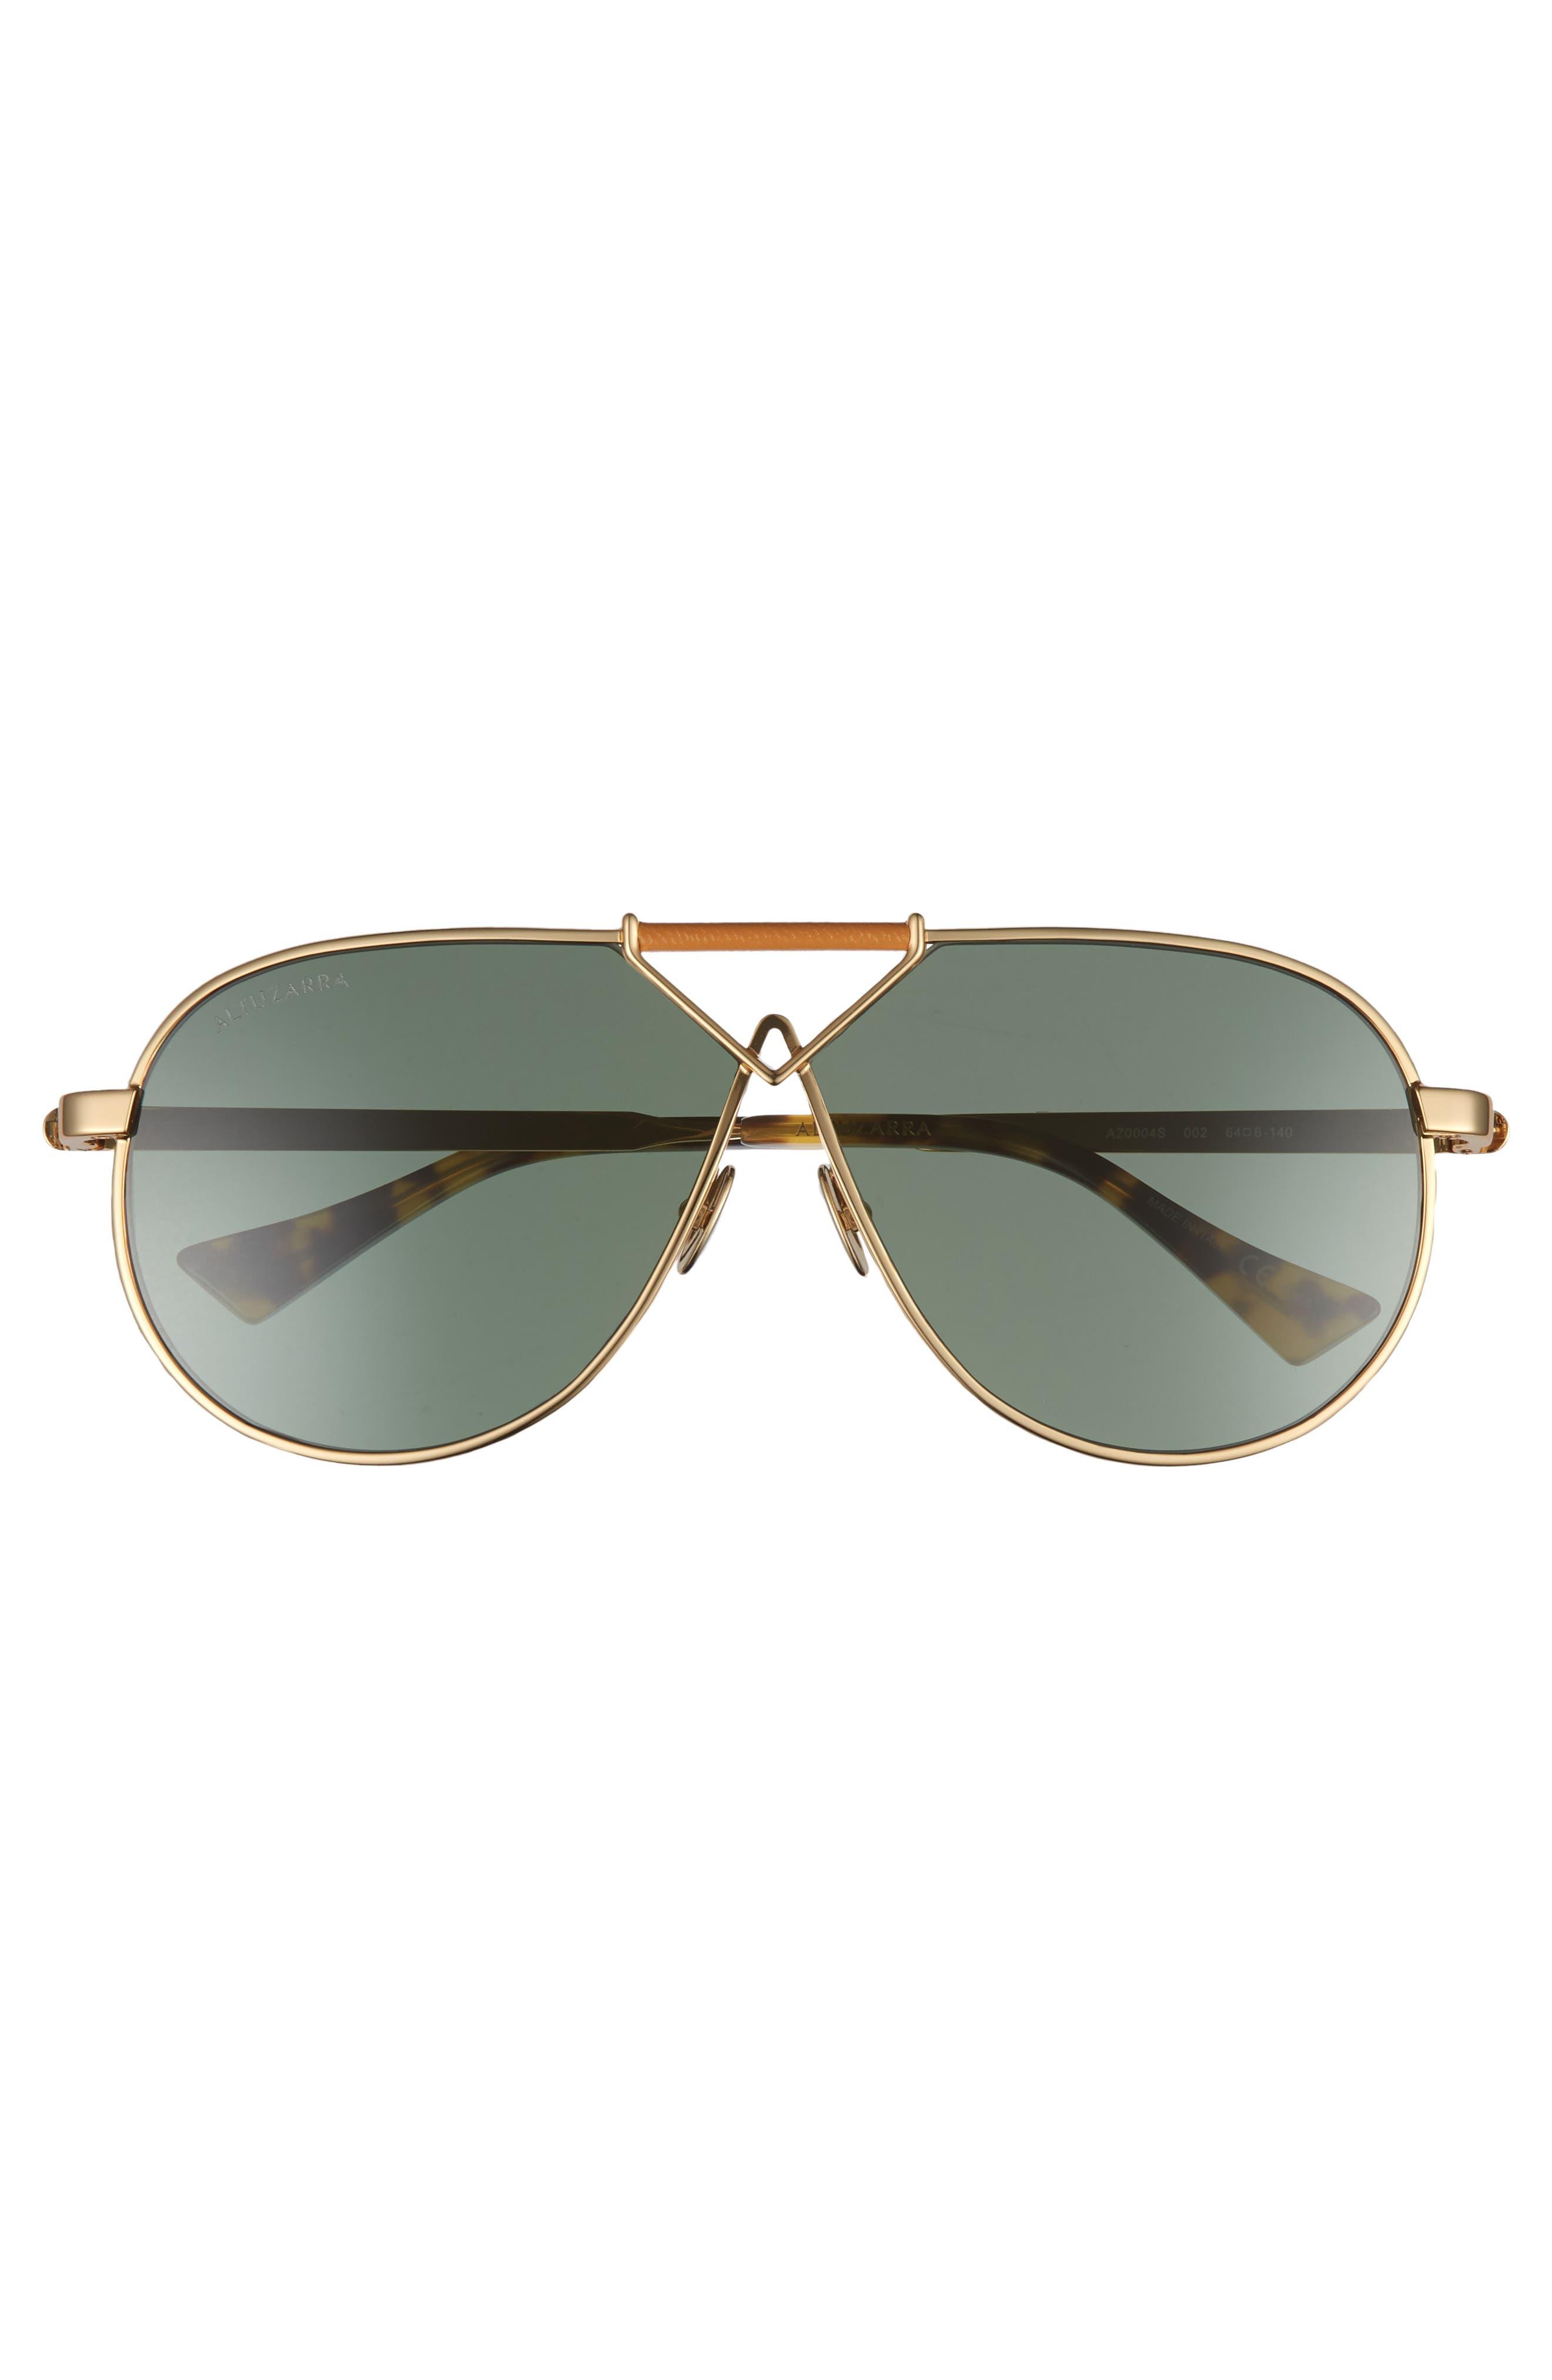 64mm Aviator Sunglasses,                             Alternate thumbnail 3, color,                             Gold